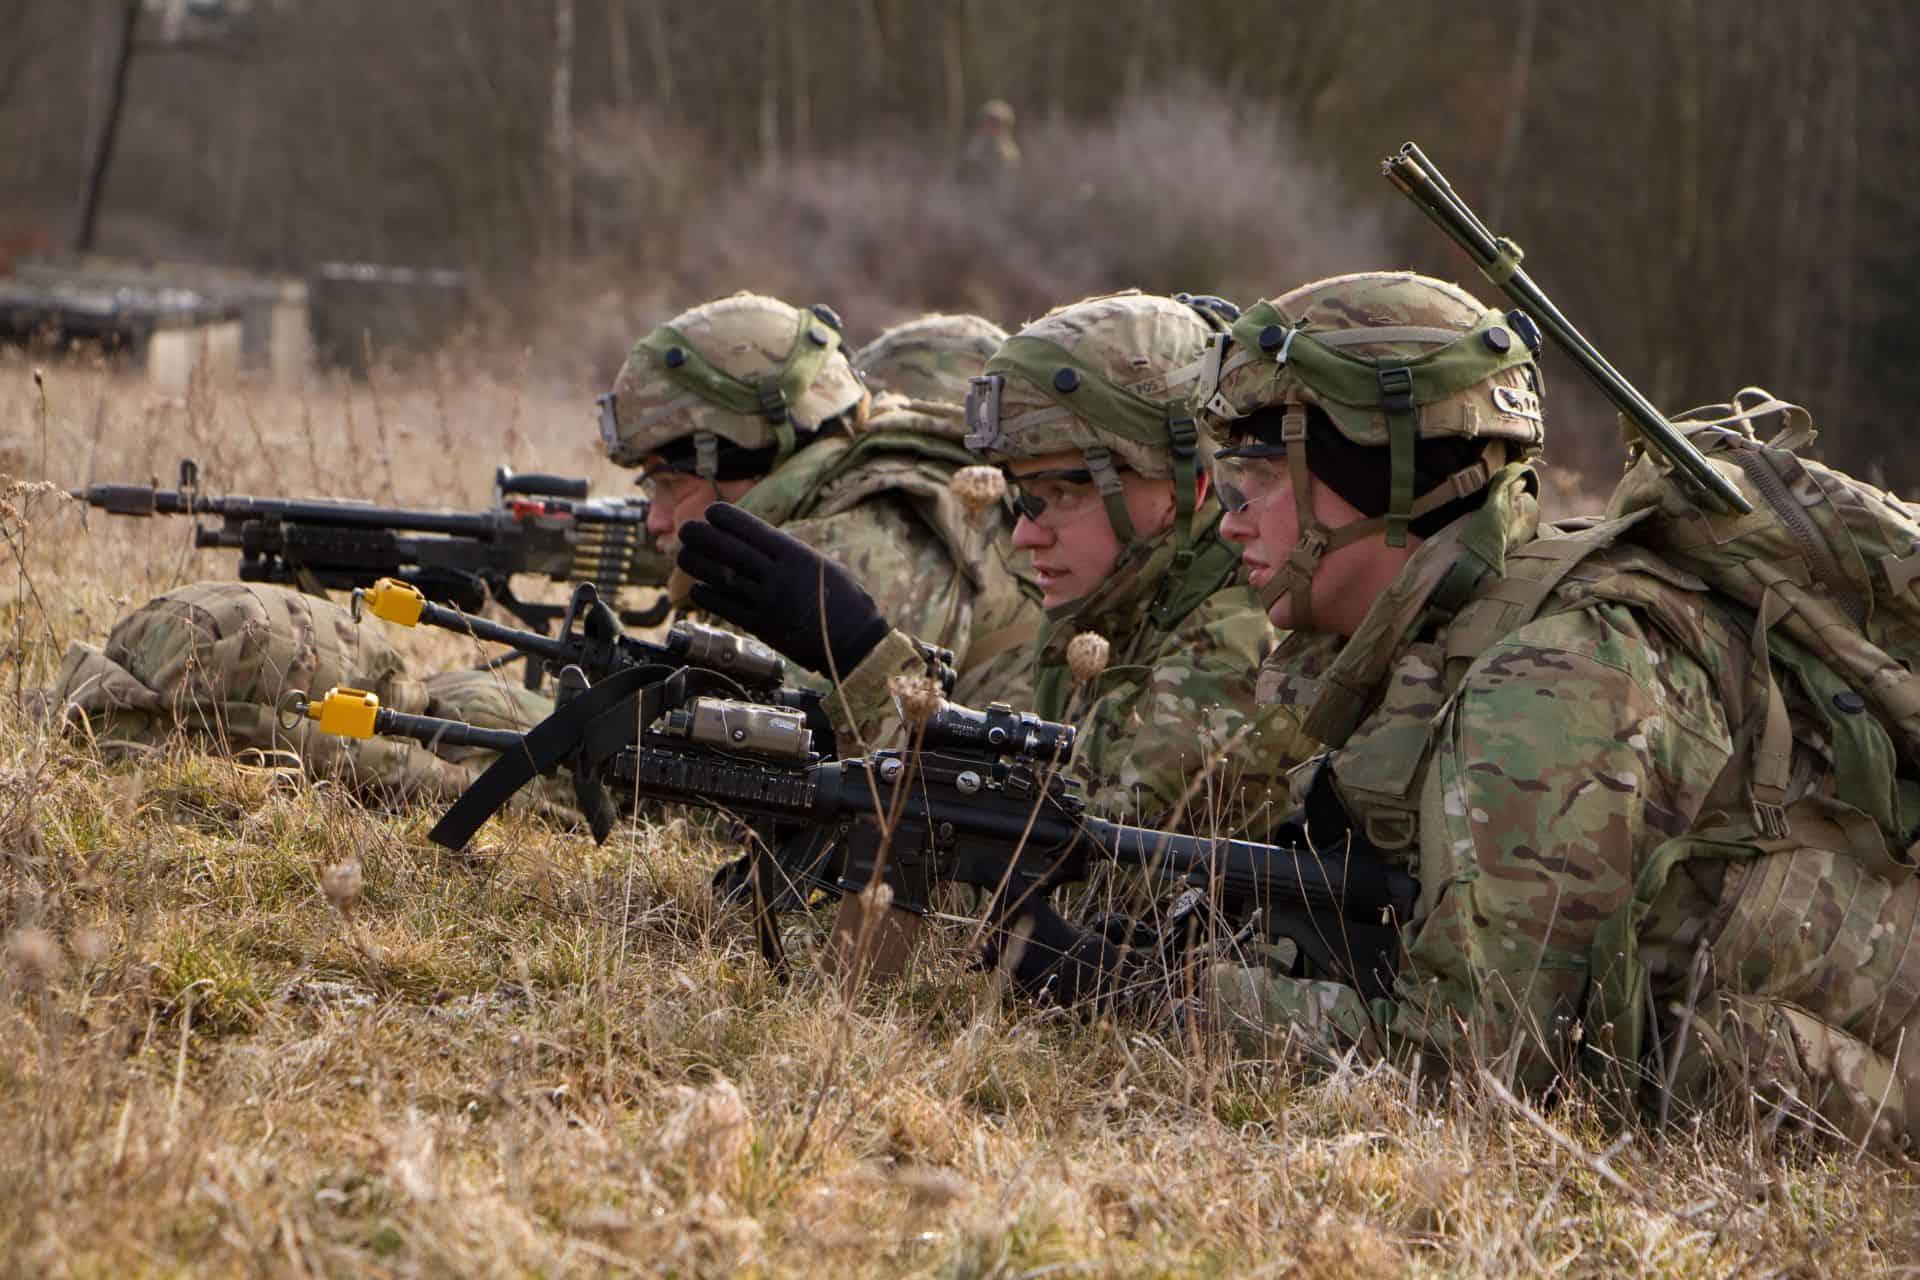 US Army looks to modernize safety doctrineDefenceTalk.com ...